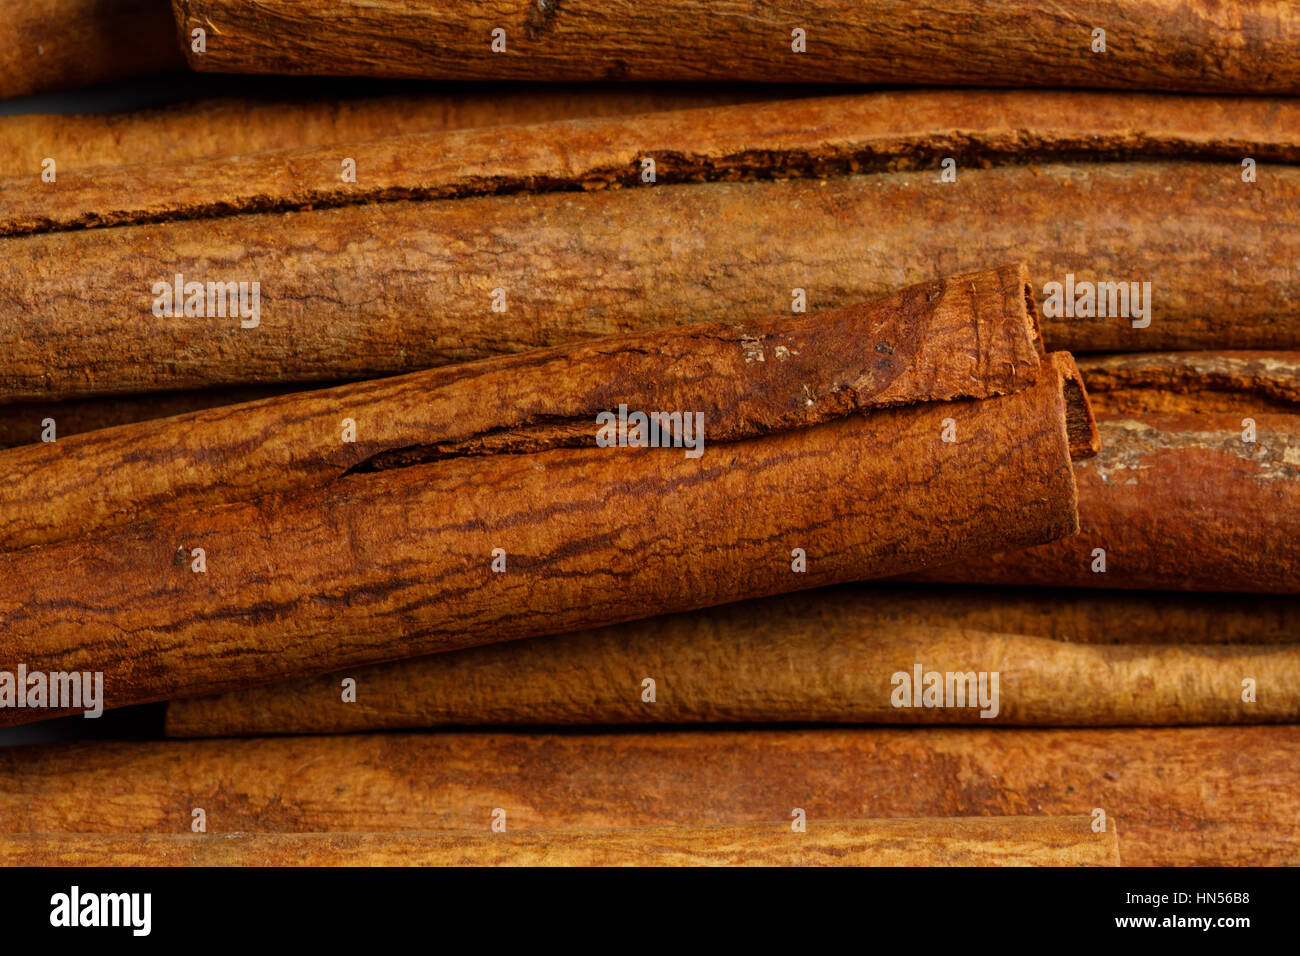 cinnamon raw food ingredient texture macro close up detailed Stock Photo